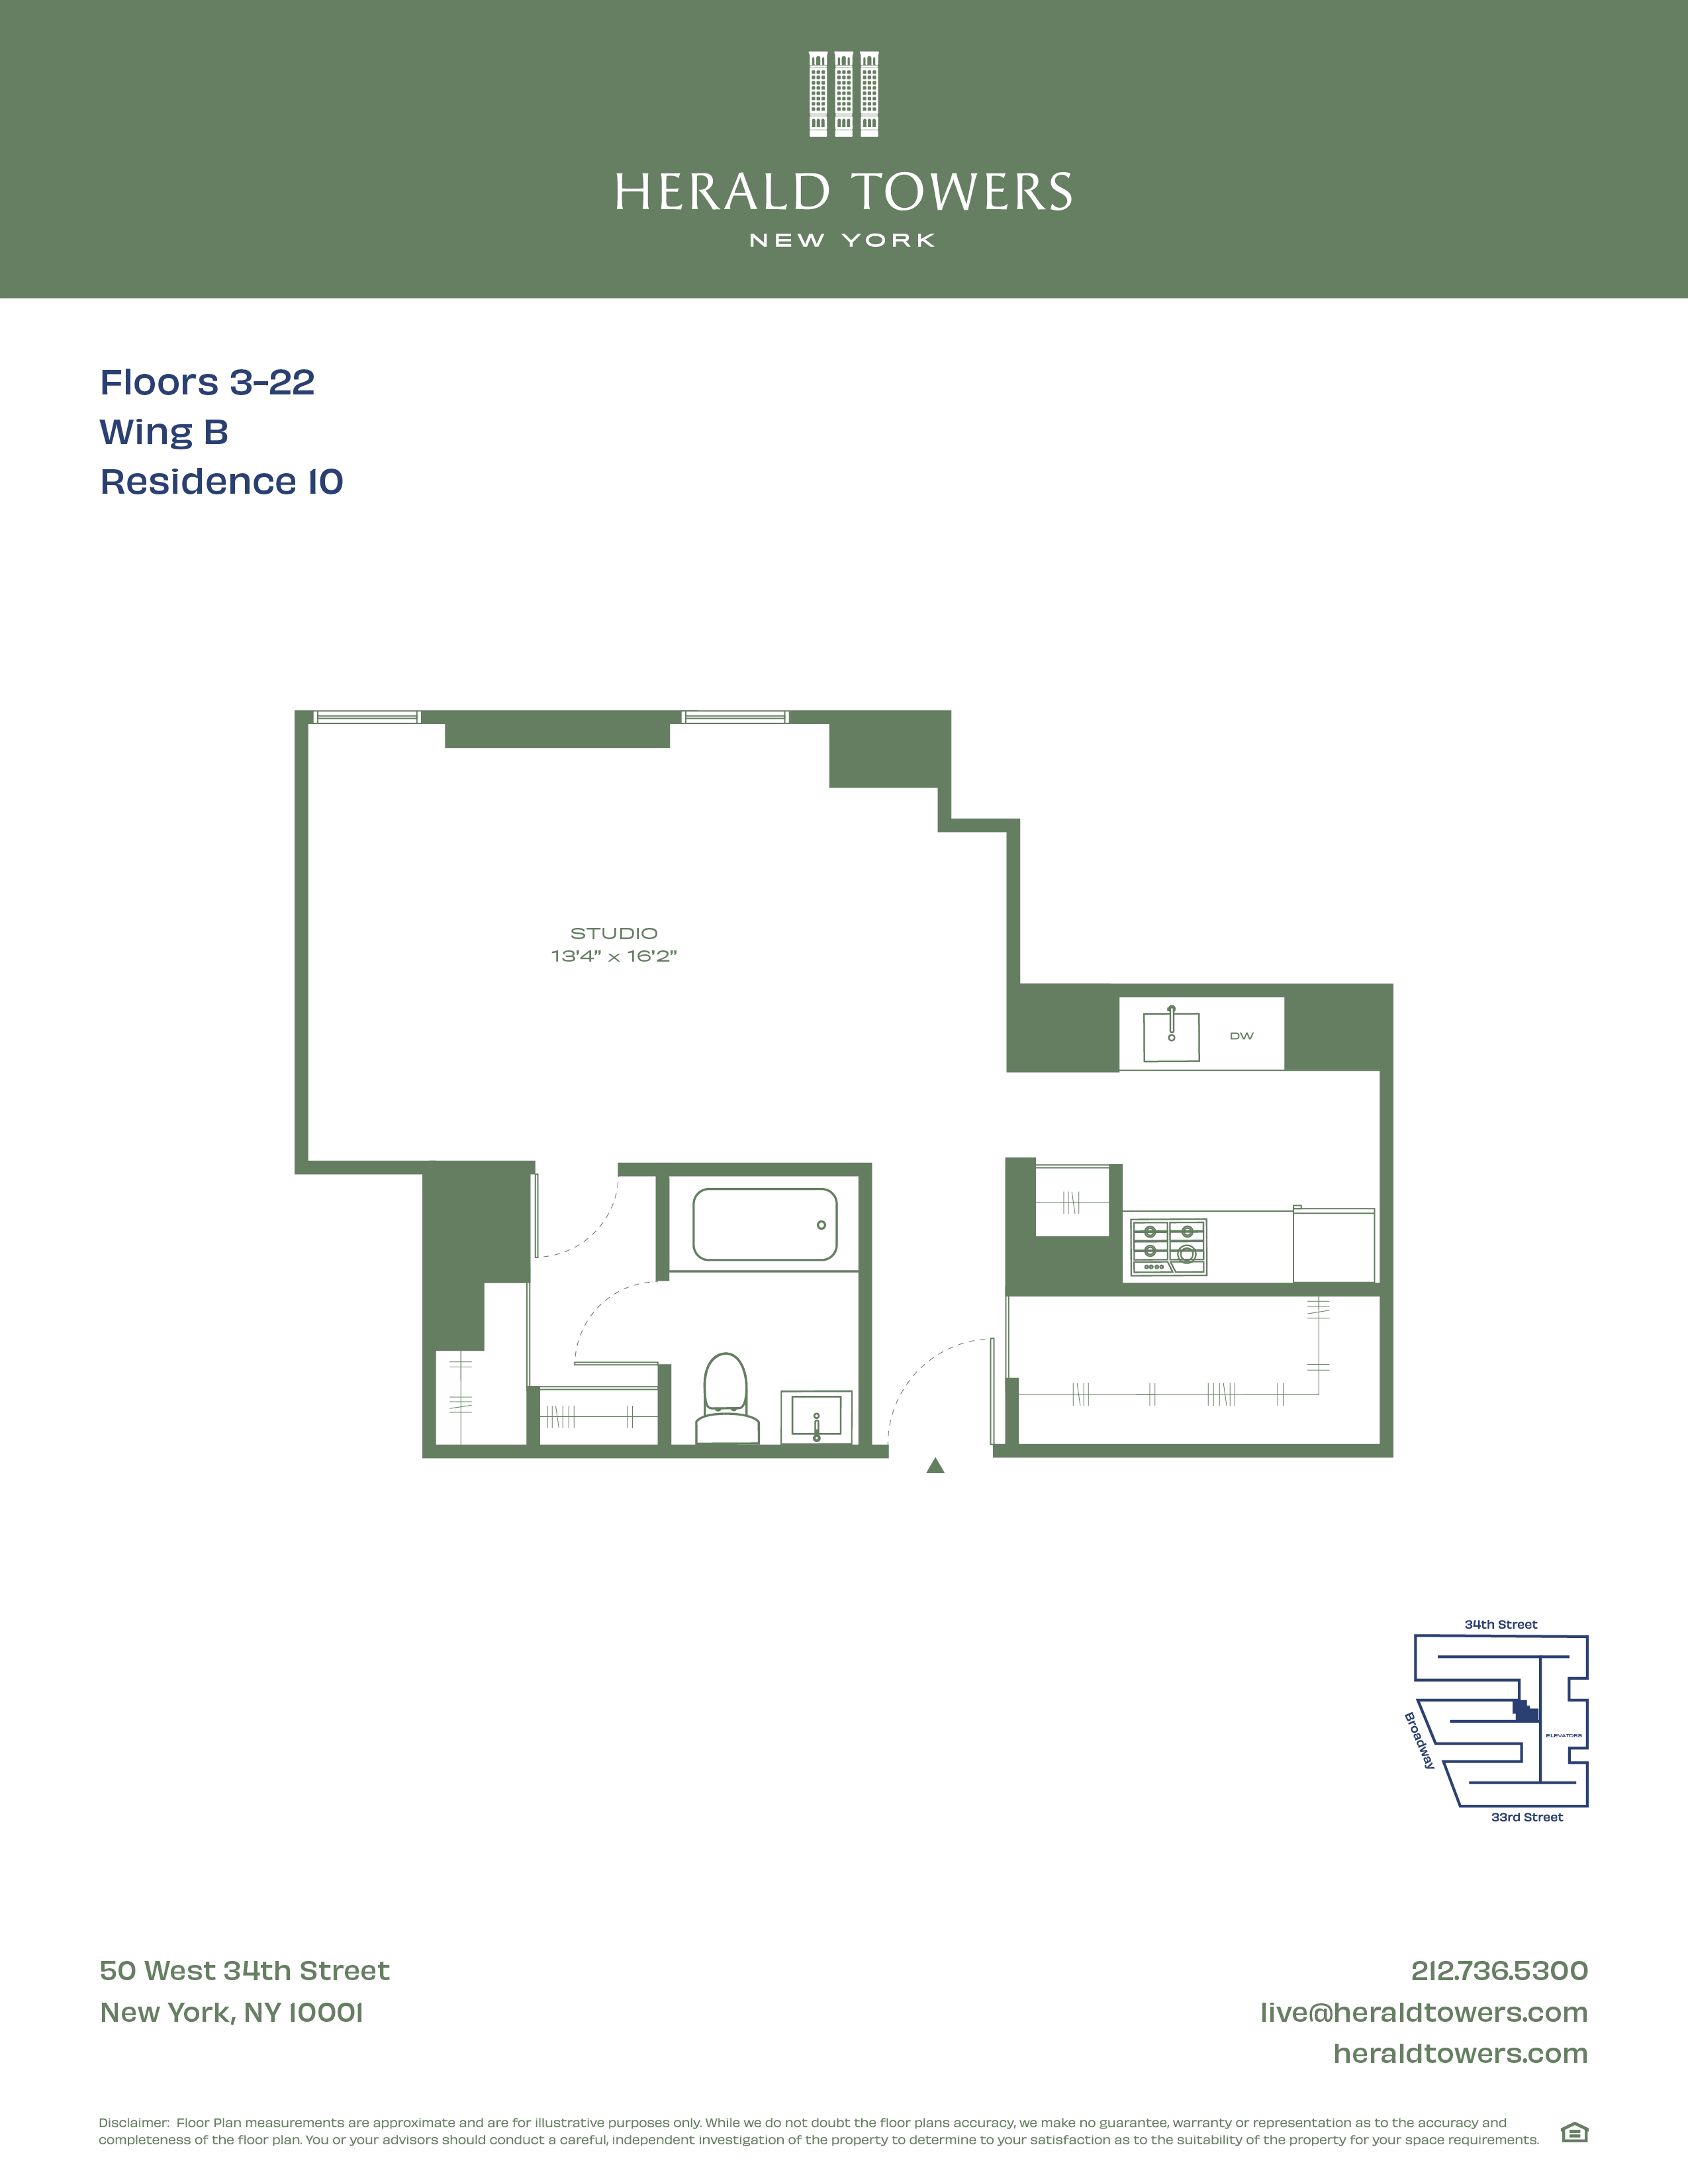 Floor plan for 7B10